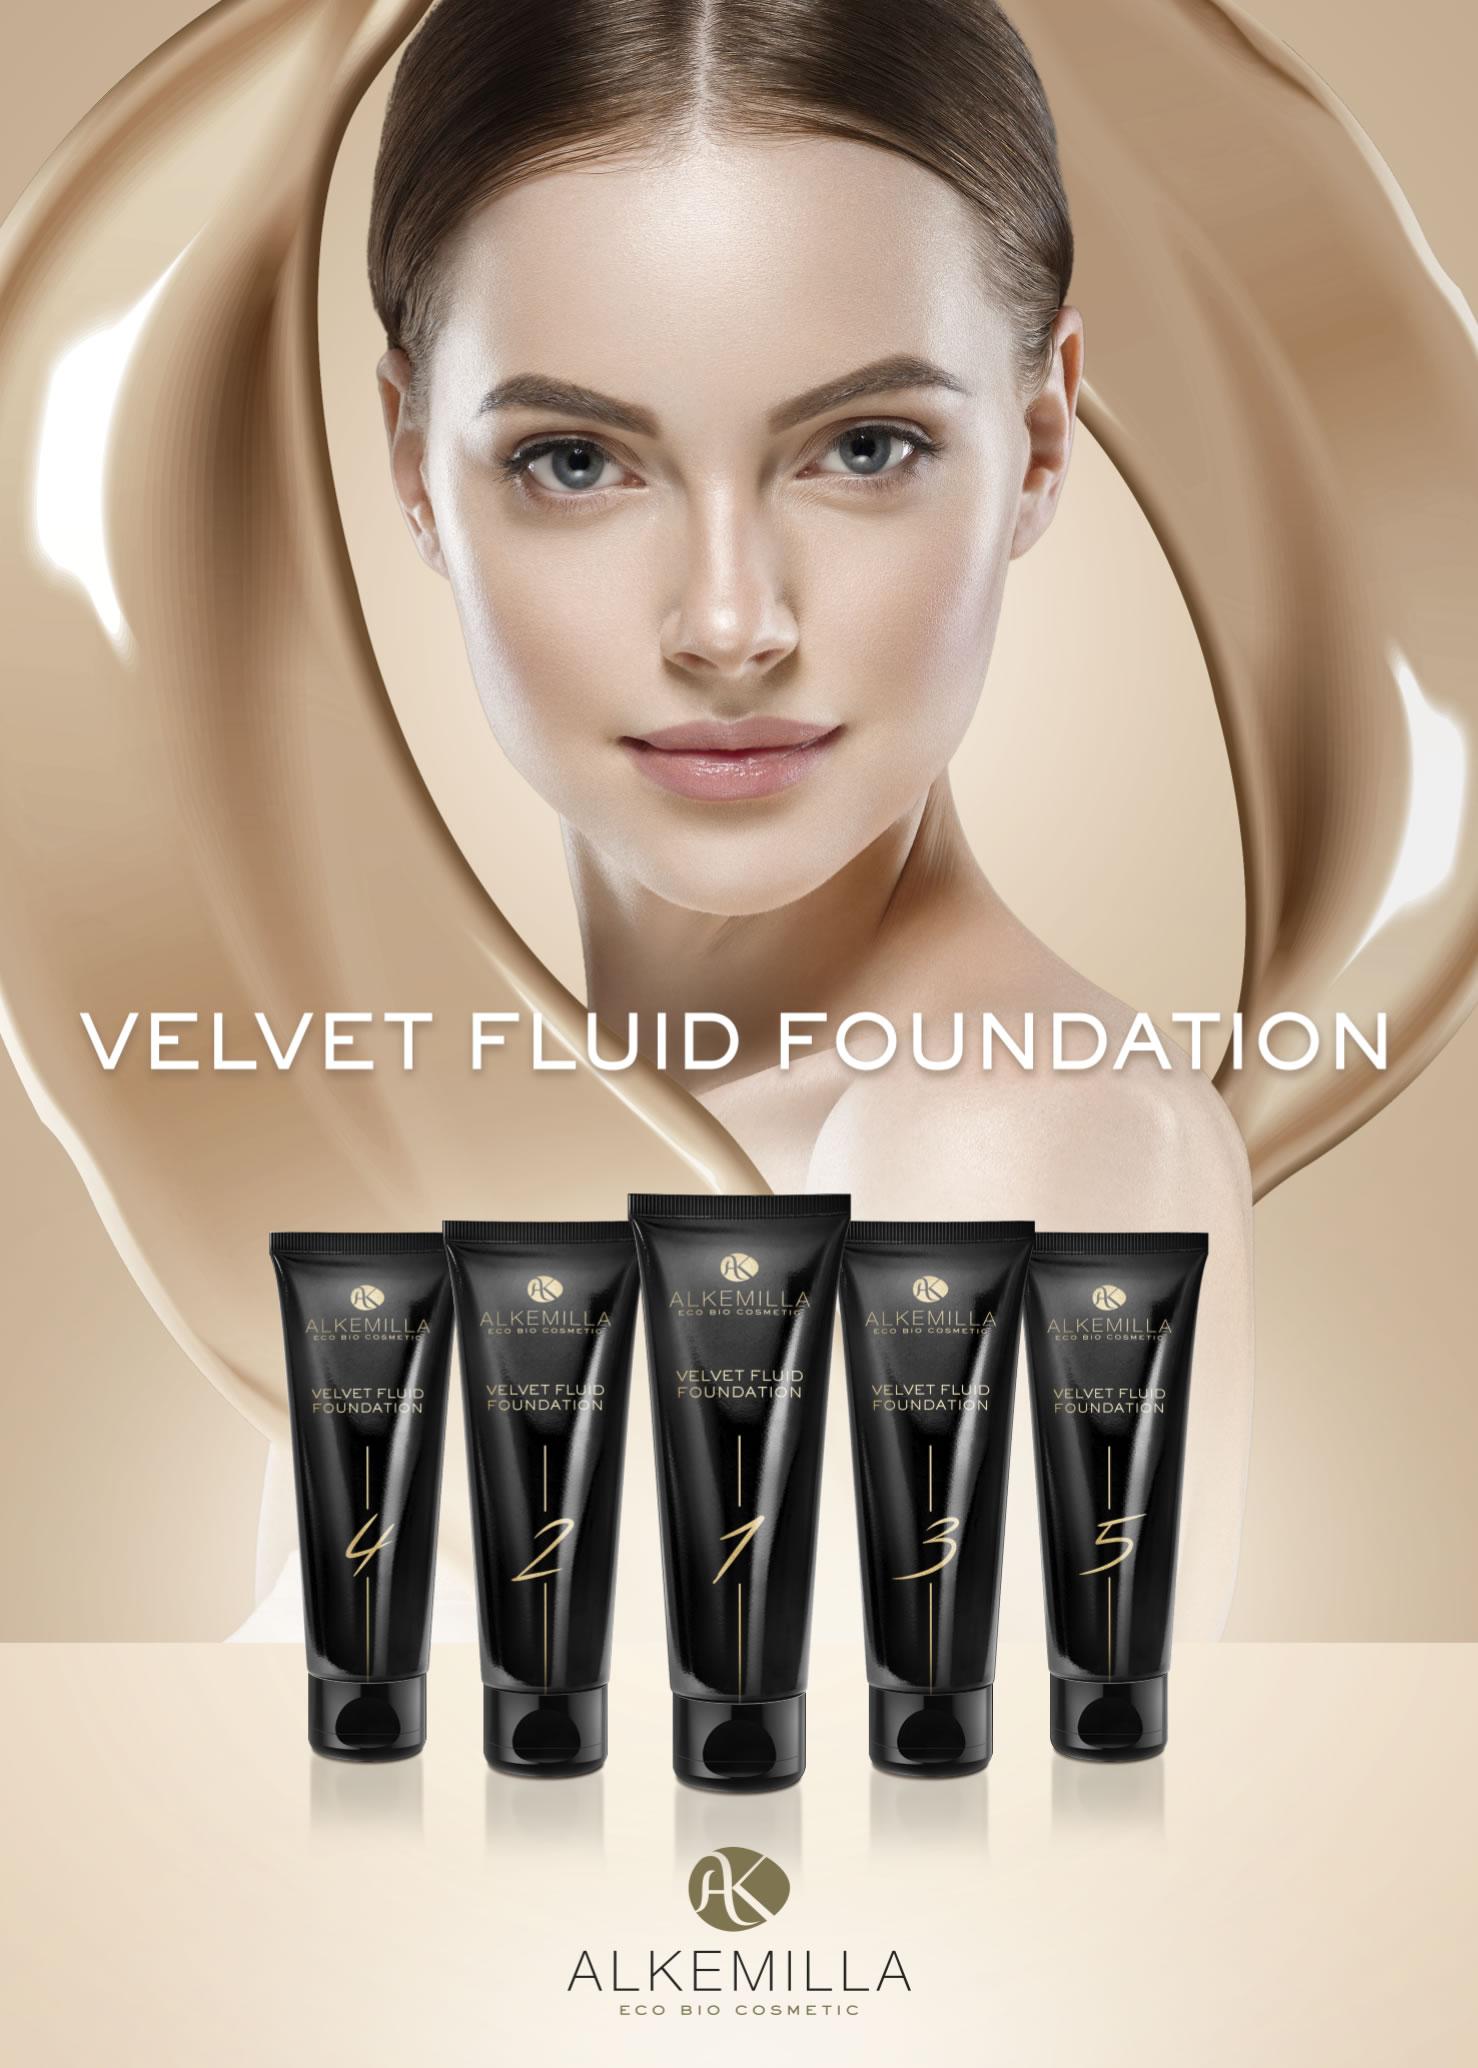 Alkemilla Velvet Fluid Foundation